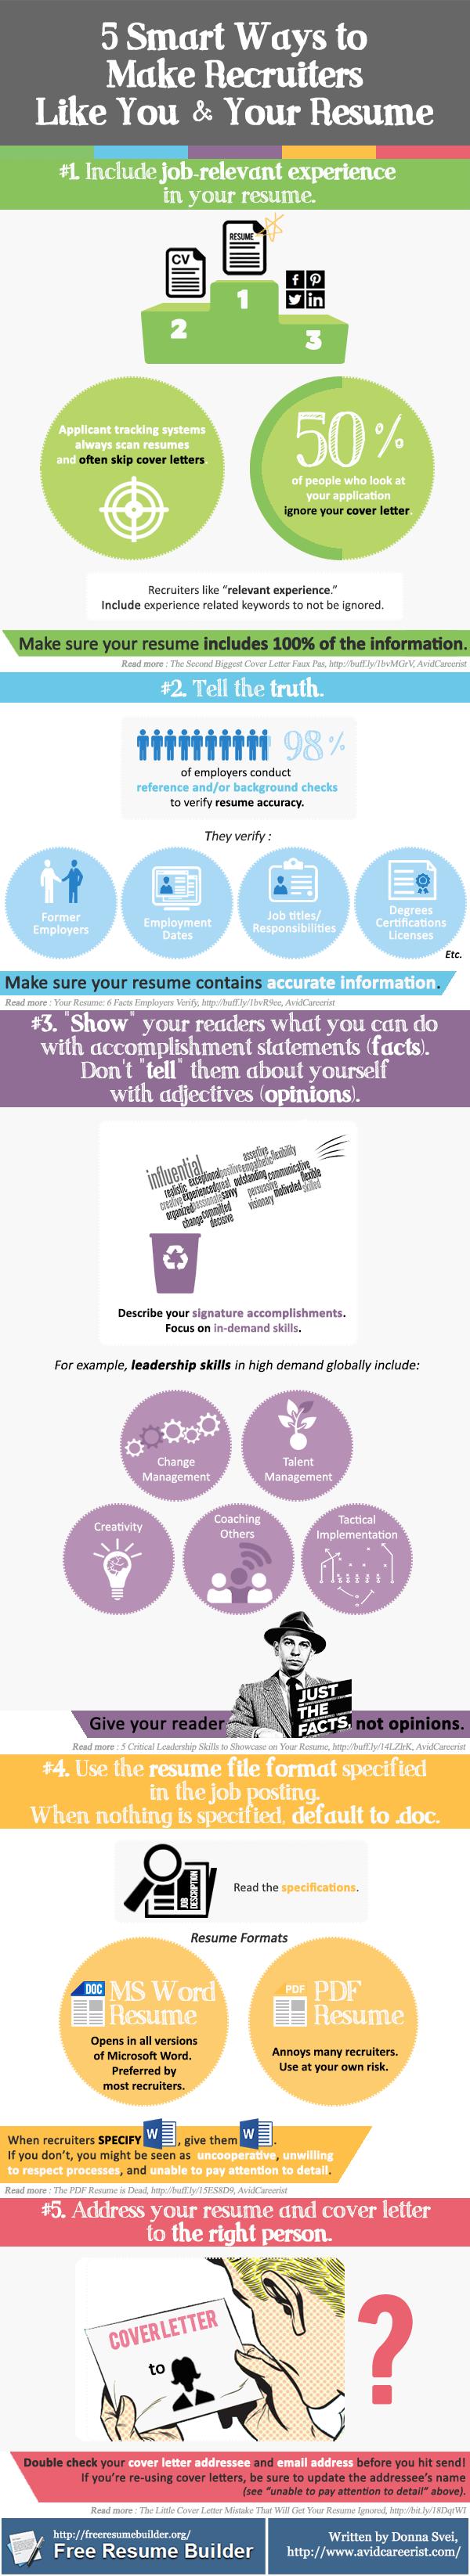 5 maneras inteligentes de que les guste tu curriculum a los reclutadores